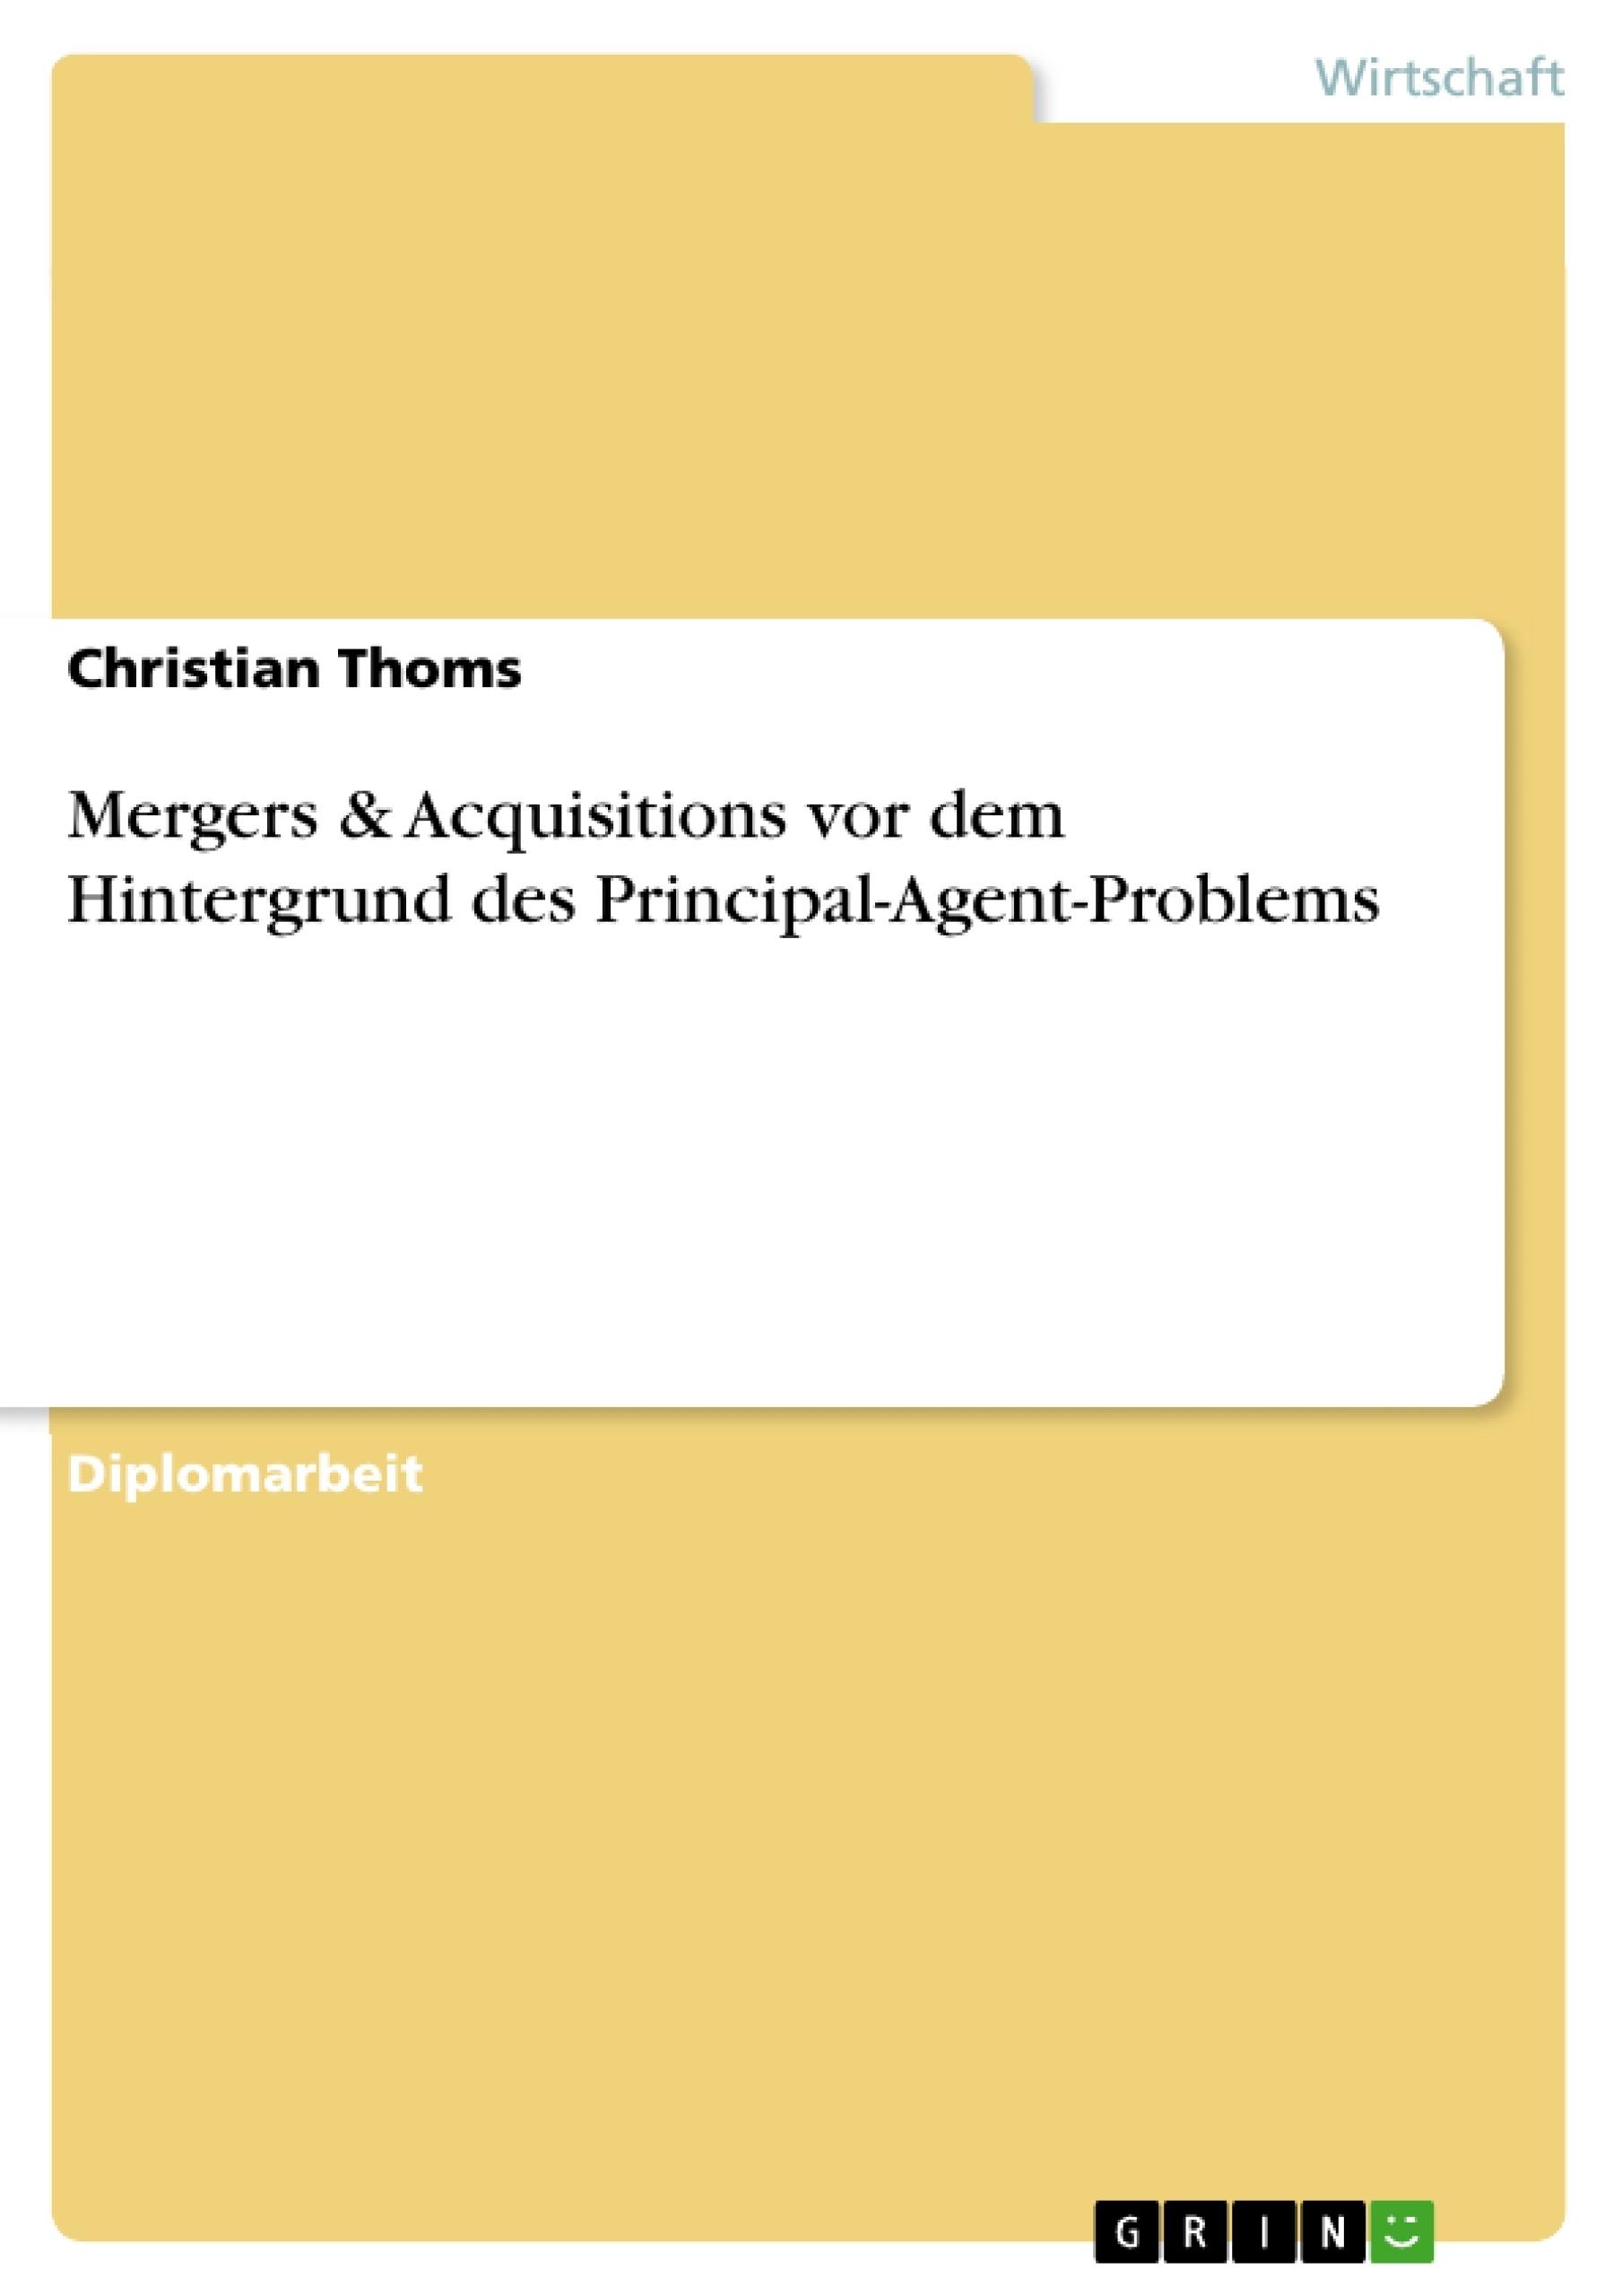 Titel: Mergers & Acquisitions vor dem Hintergrund des Principal-Agent-Problems